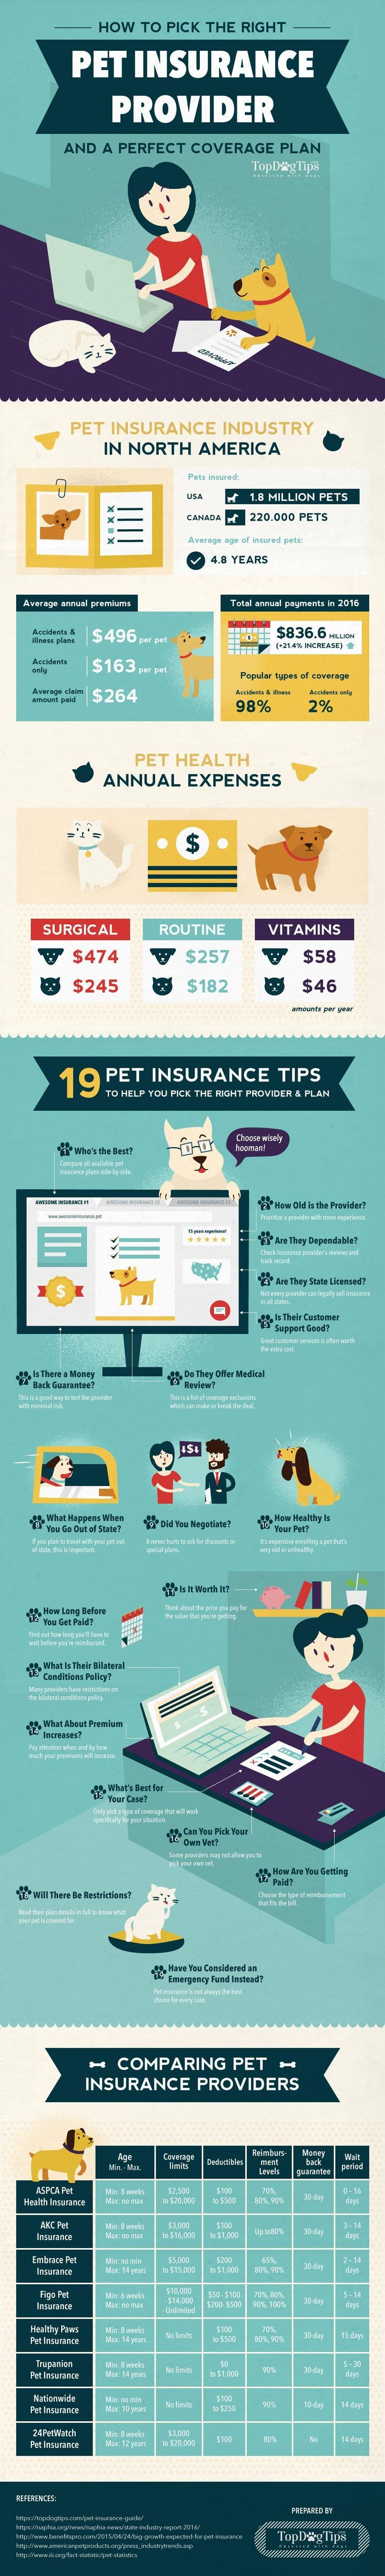 https://topdogtips.com/pet-health-insurance-tips/ #Doginsurancepethealth